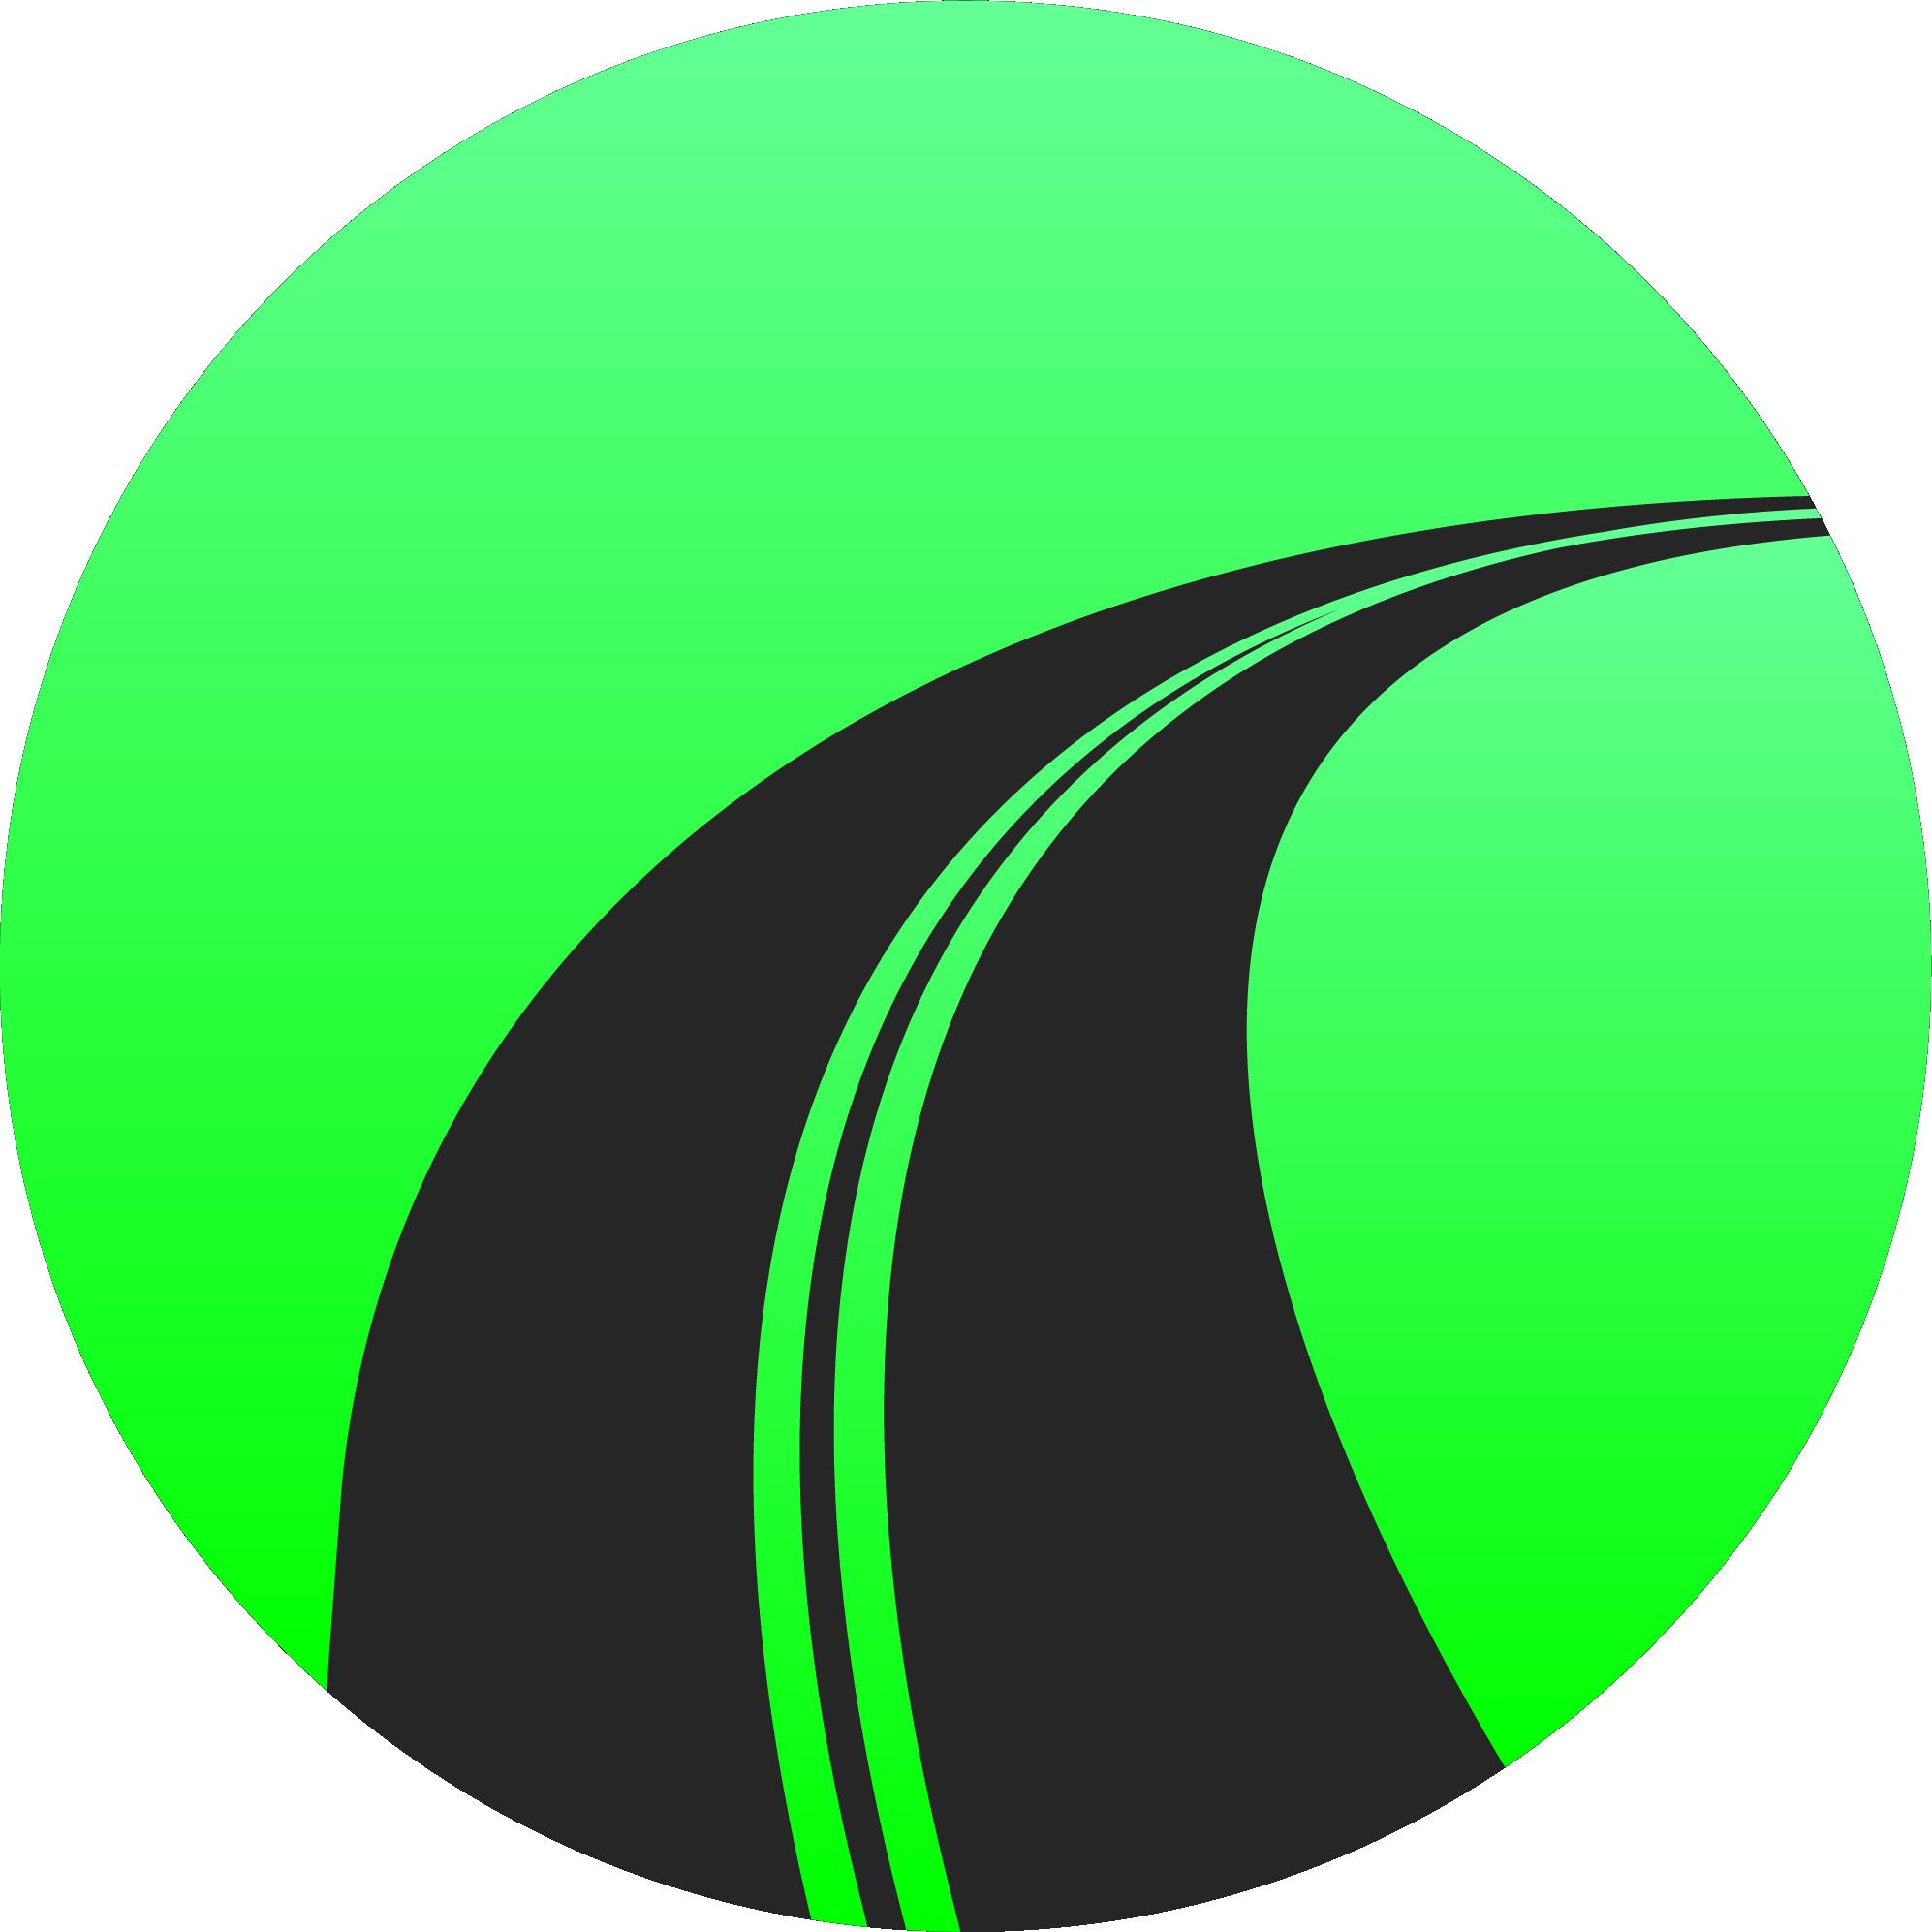 Logo - DarkBG - PNG.png